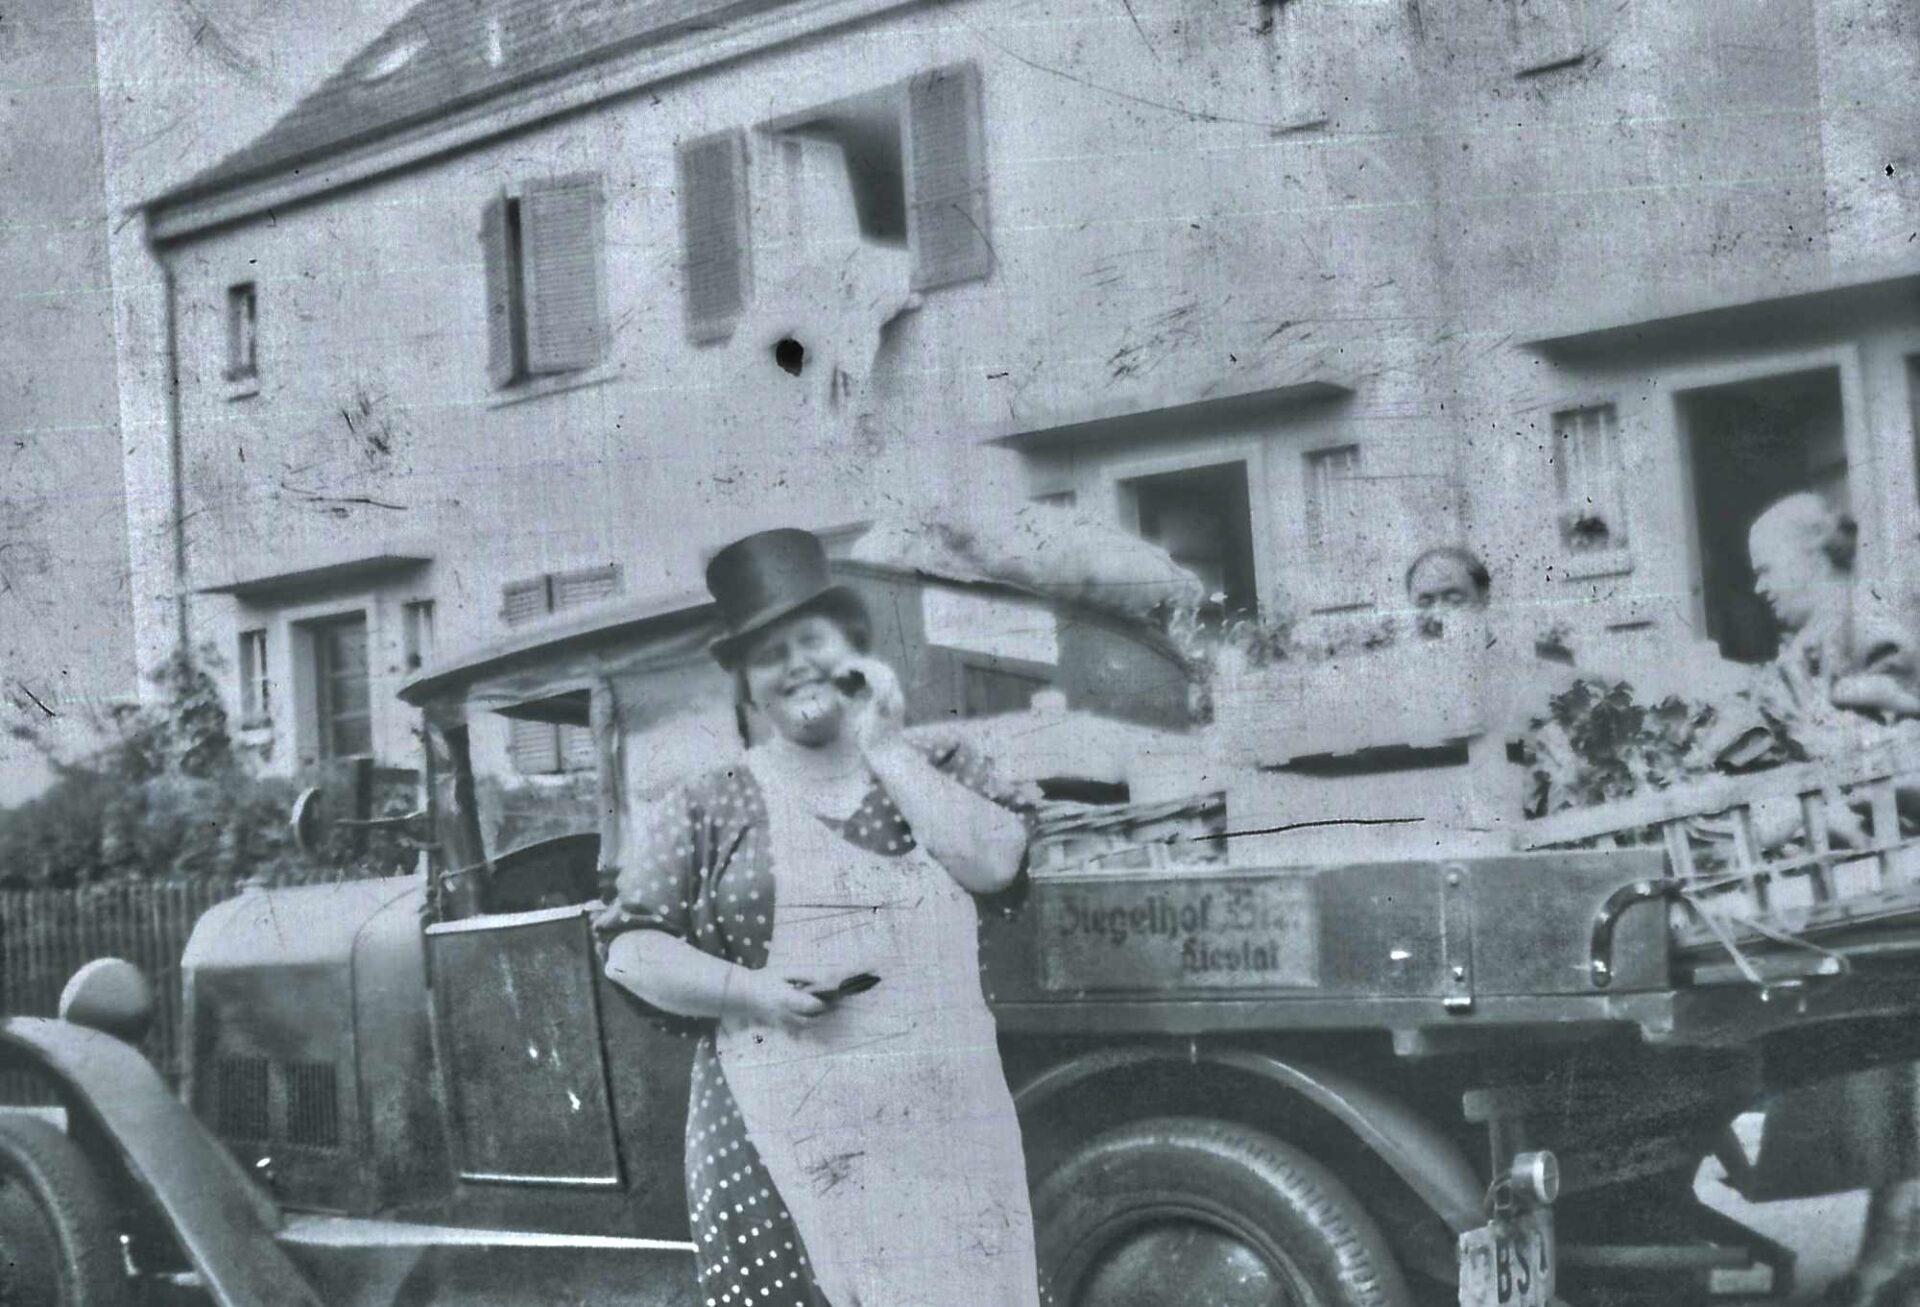 Bild: Maria Gürtler-Baumann an einem Gemüsewagen